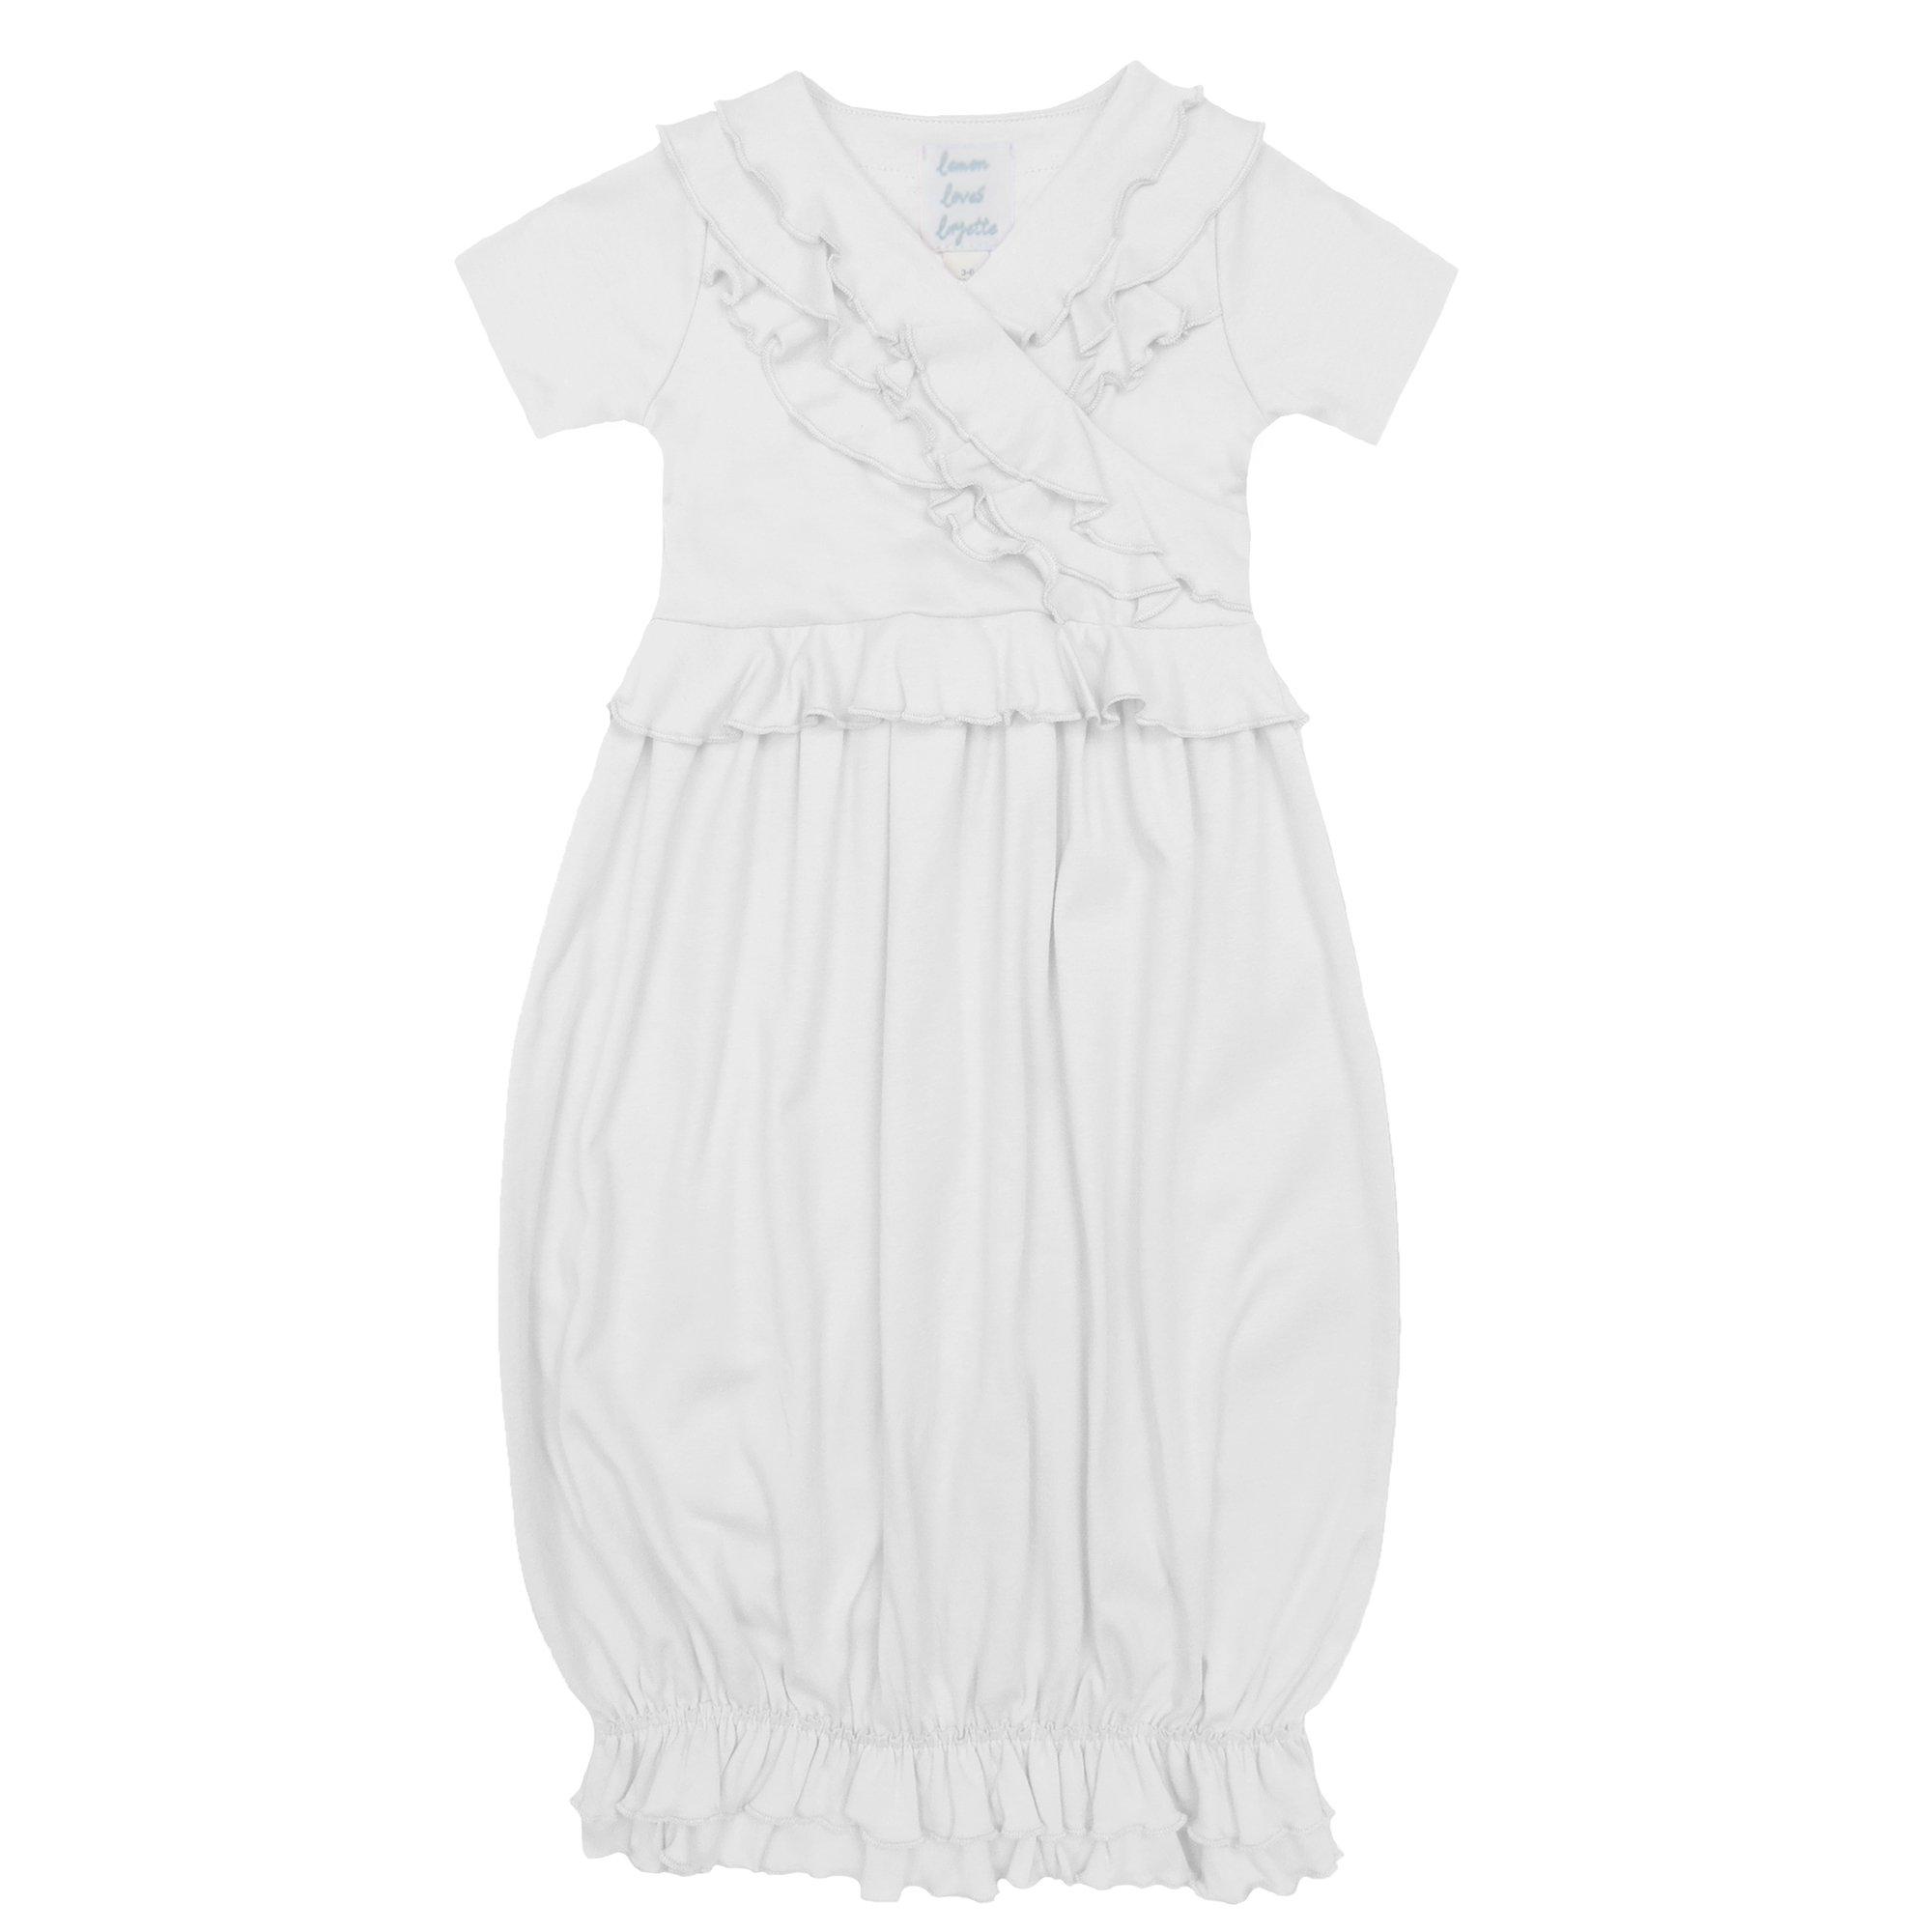 Lemon Loves Layette Julia Baby Gown in White